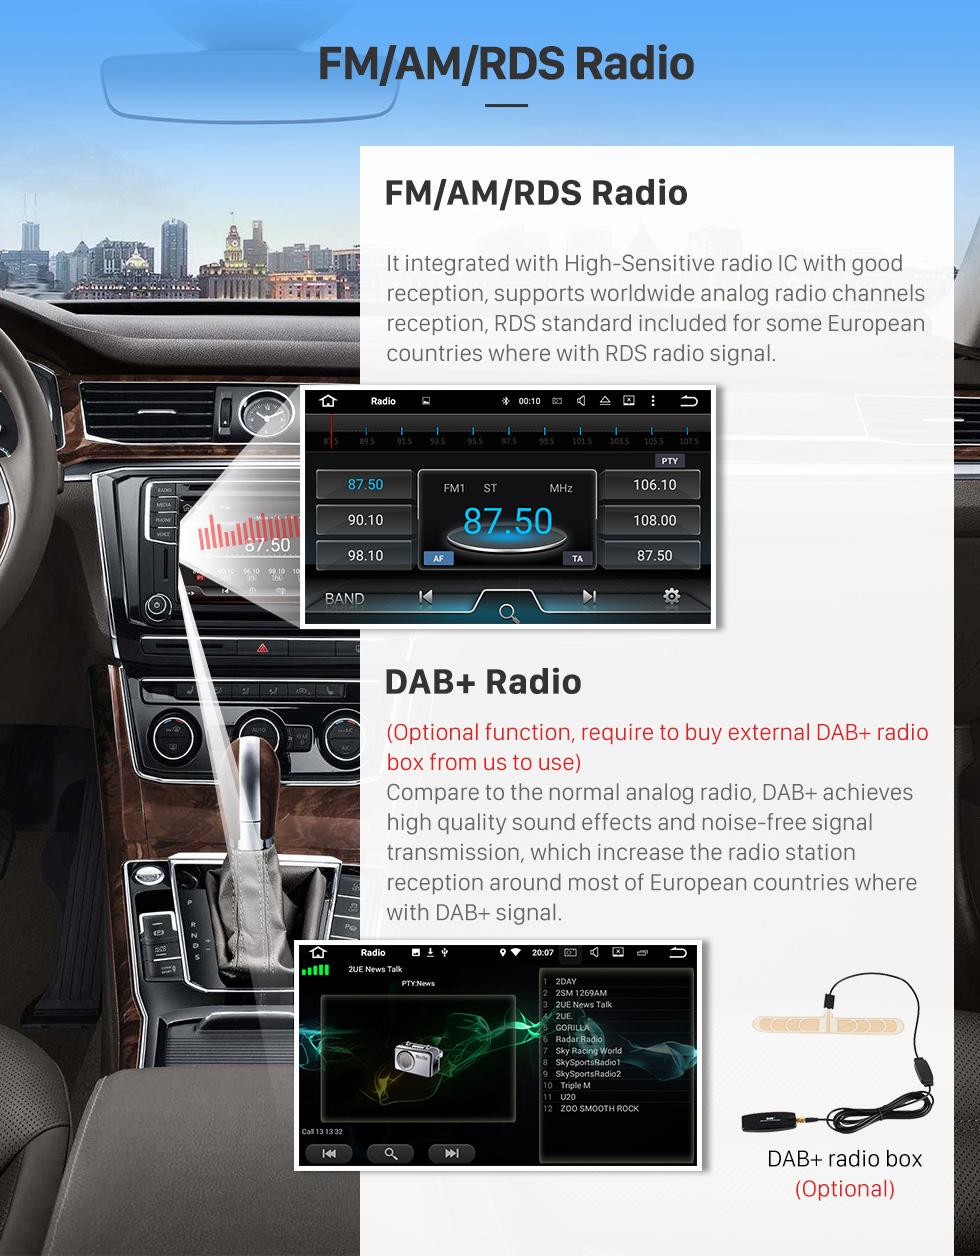 Seicane 6,2 Zoll HD Touchscreen Android 8.0 Radio Kopfeinheit Für 2004-2012 Fiat Panda In Dash DVD-Player GPS-Navigationssystem Bluetooth Telefon WIFI Unterstützung DVR USB Digital TV Lenkradsteuerung